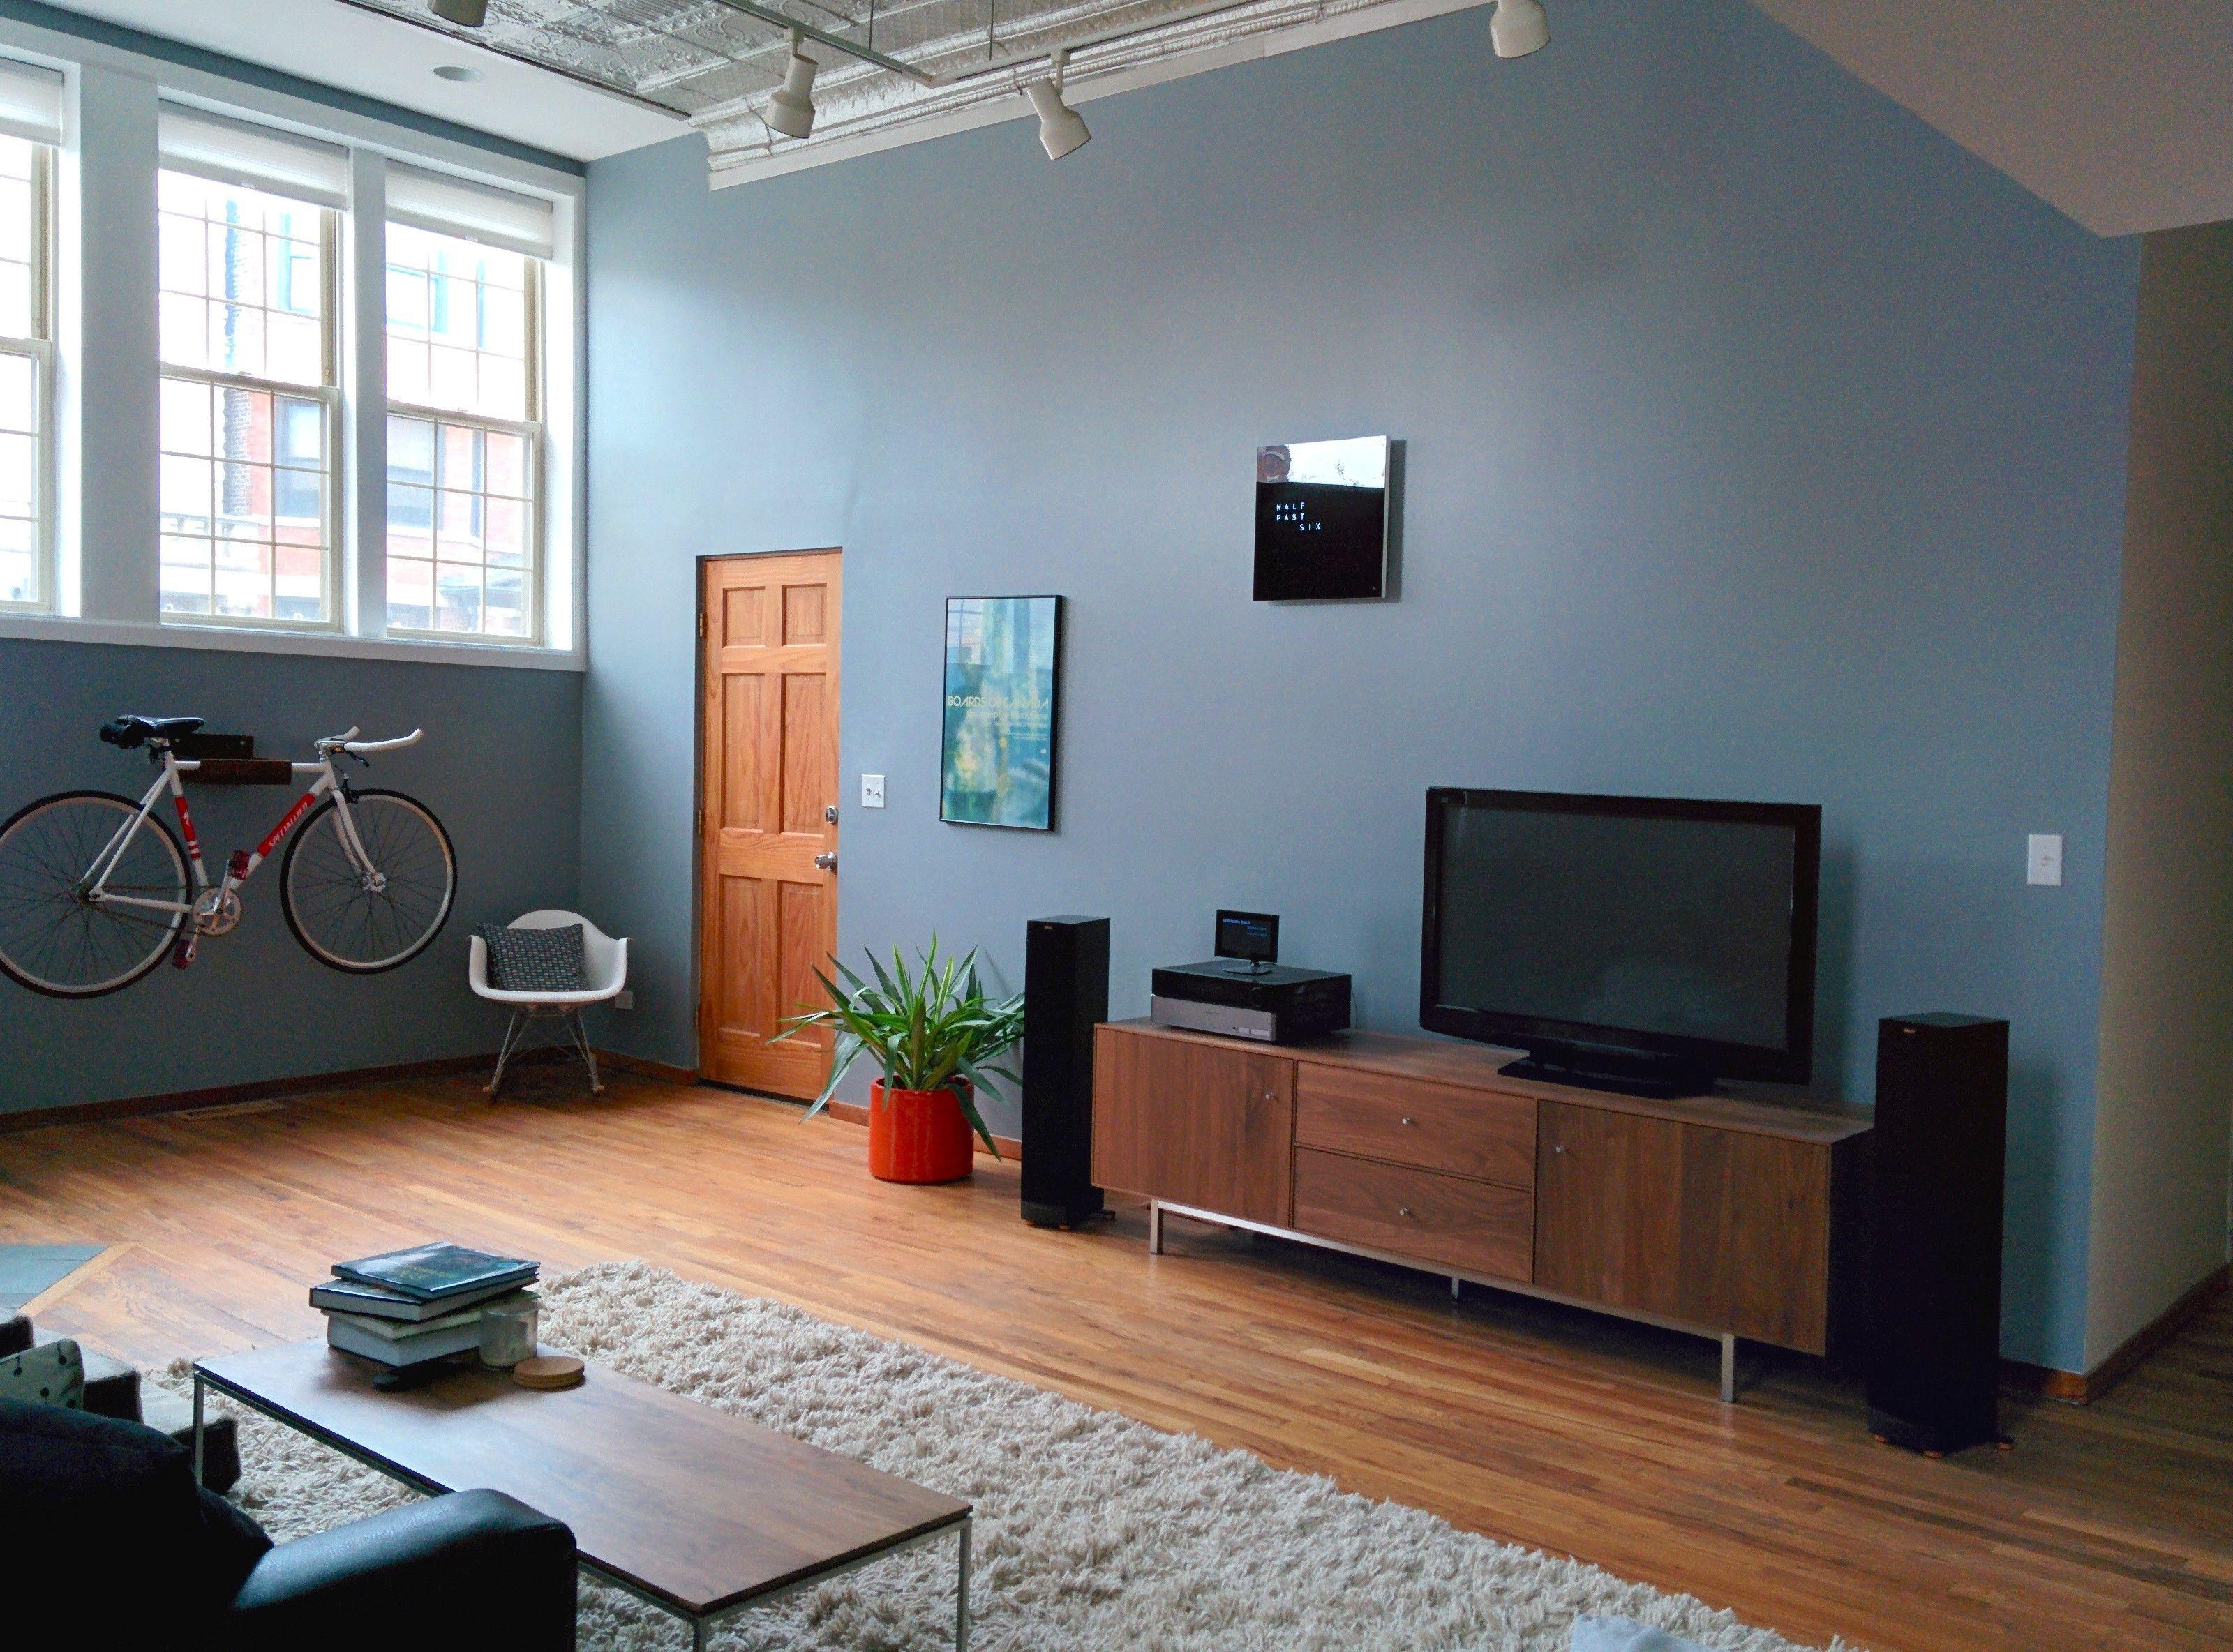 Man Cave Design Plans Mancaveideas Male Living Space Male Living Room Living Space Decor Living room ideas reddit